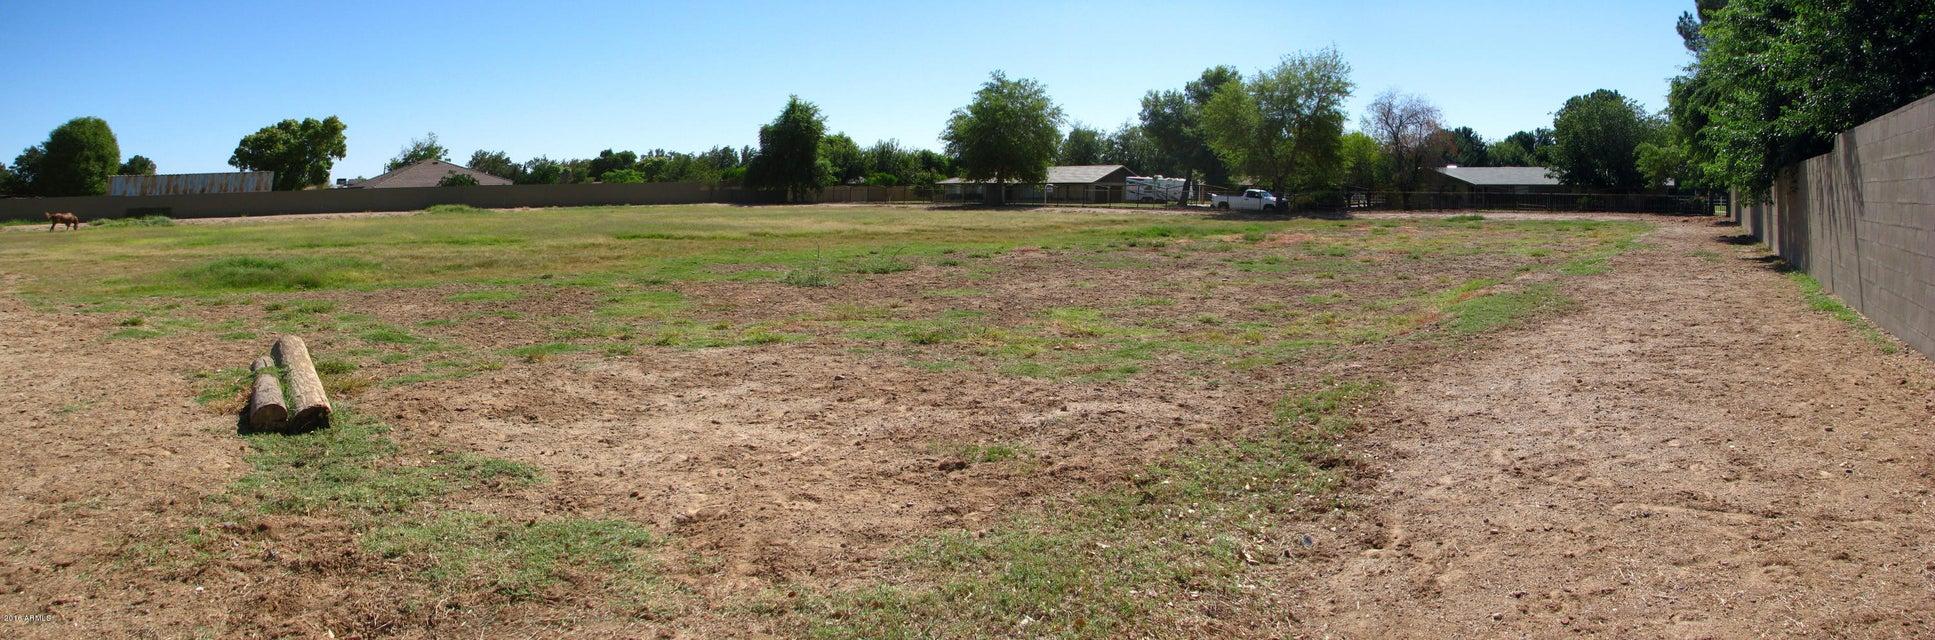 8010 W Country Gables Drive, Peoria, AZ 85381